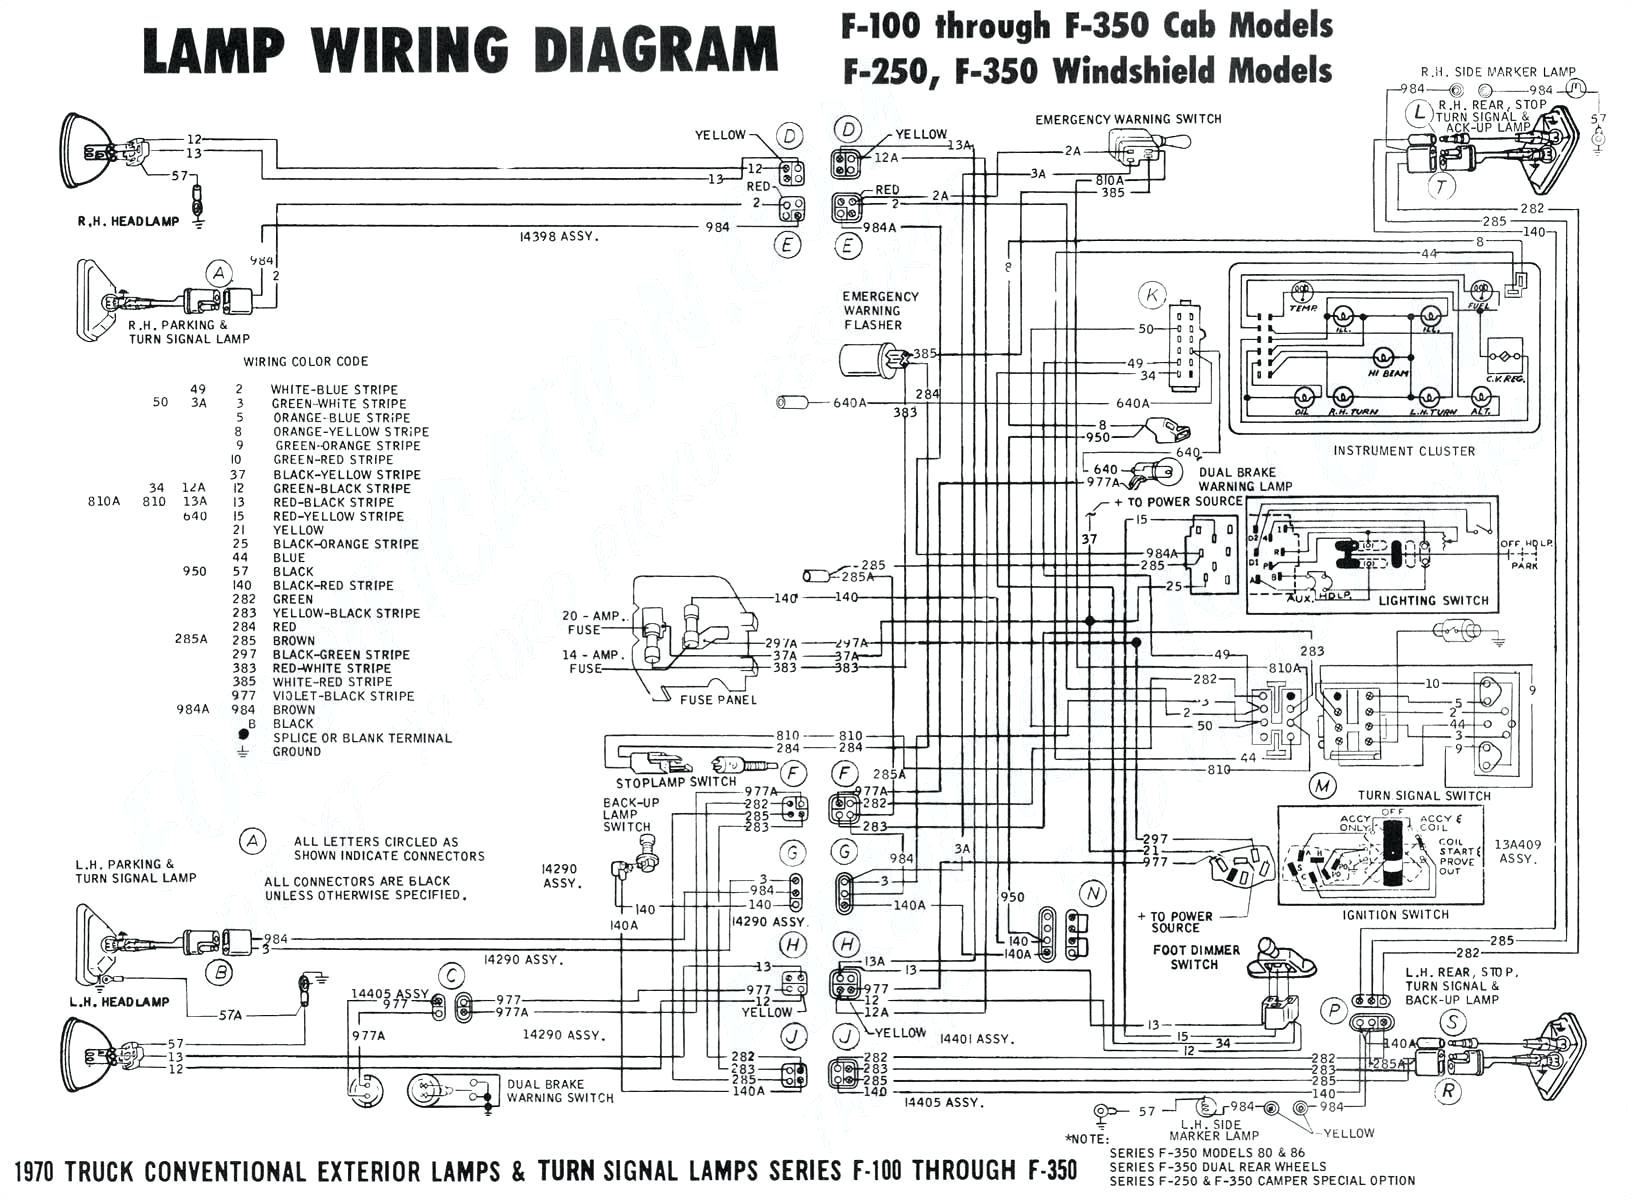 2005 ford F750 Wiring Diagram Powermate Wiring Diagrams Wiring Library